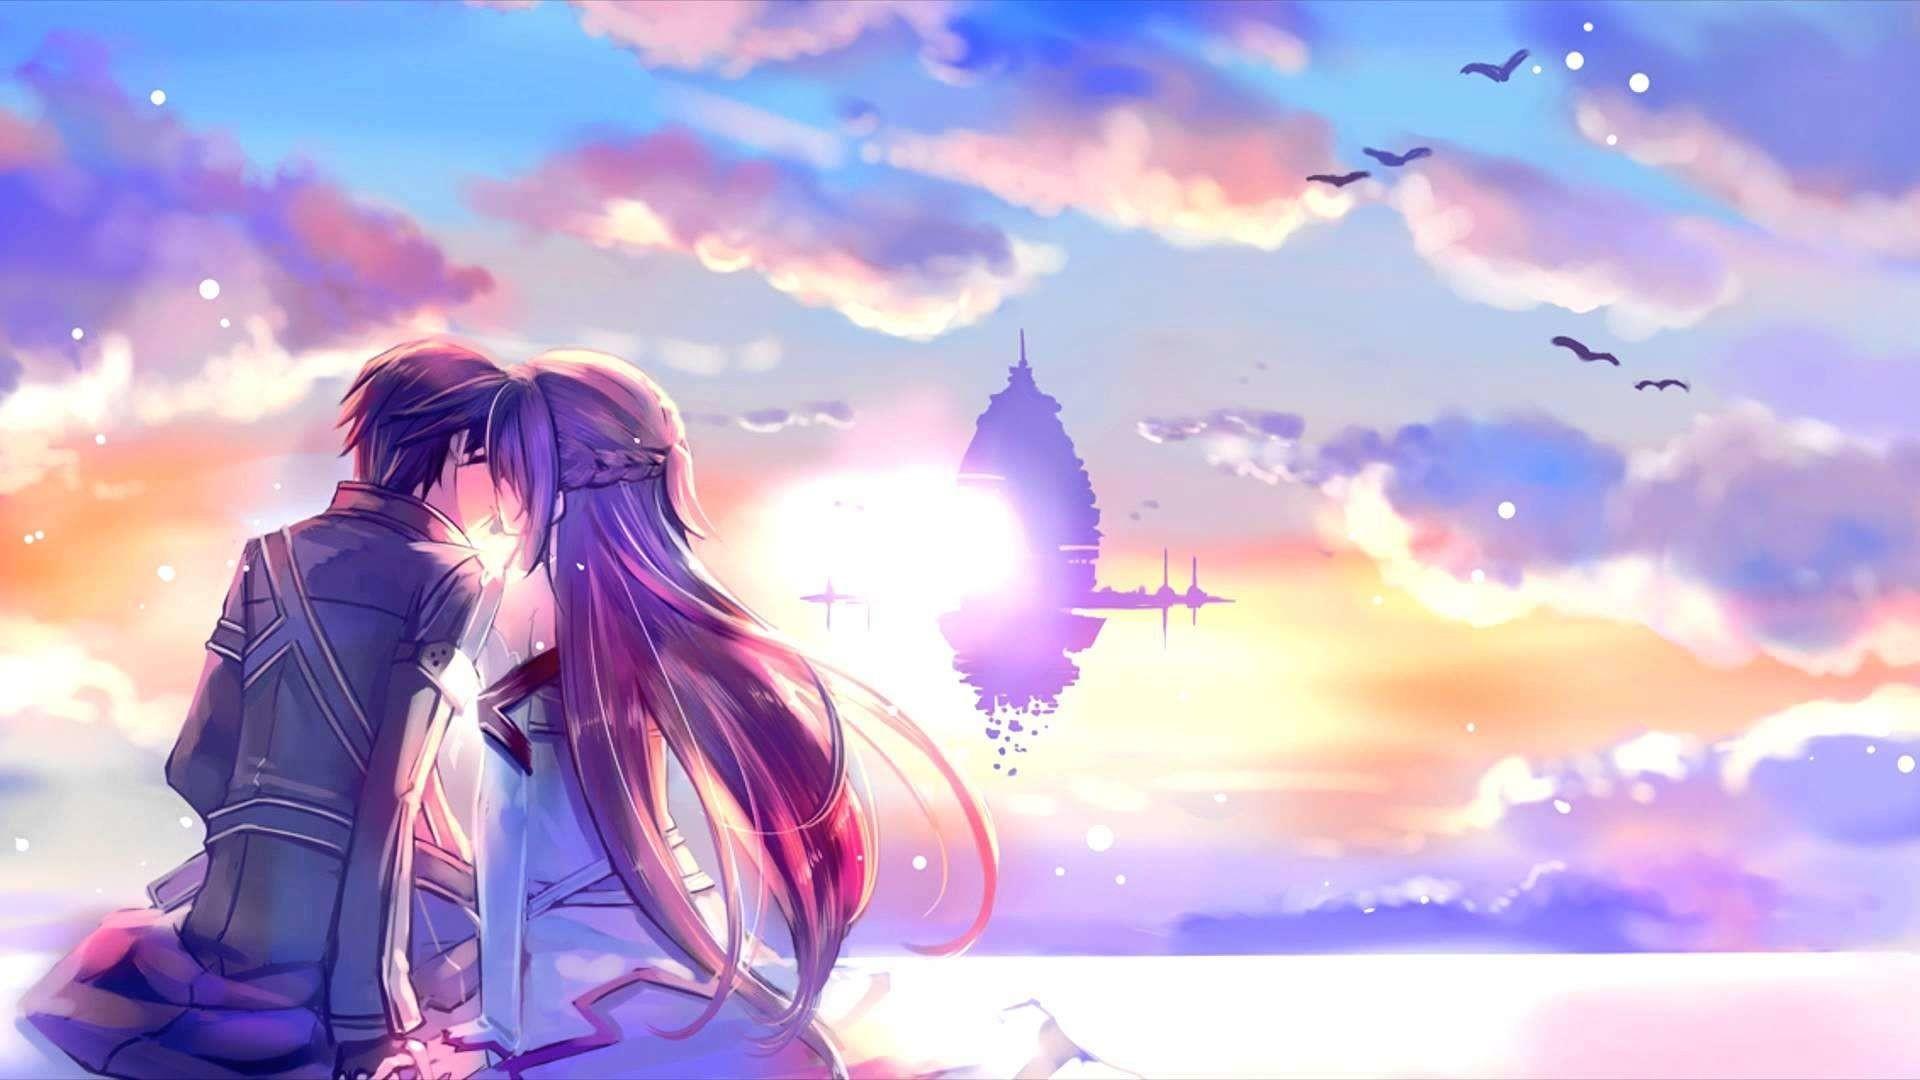 Anime Love Wallpaper Wallpapertag